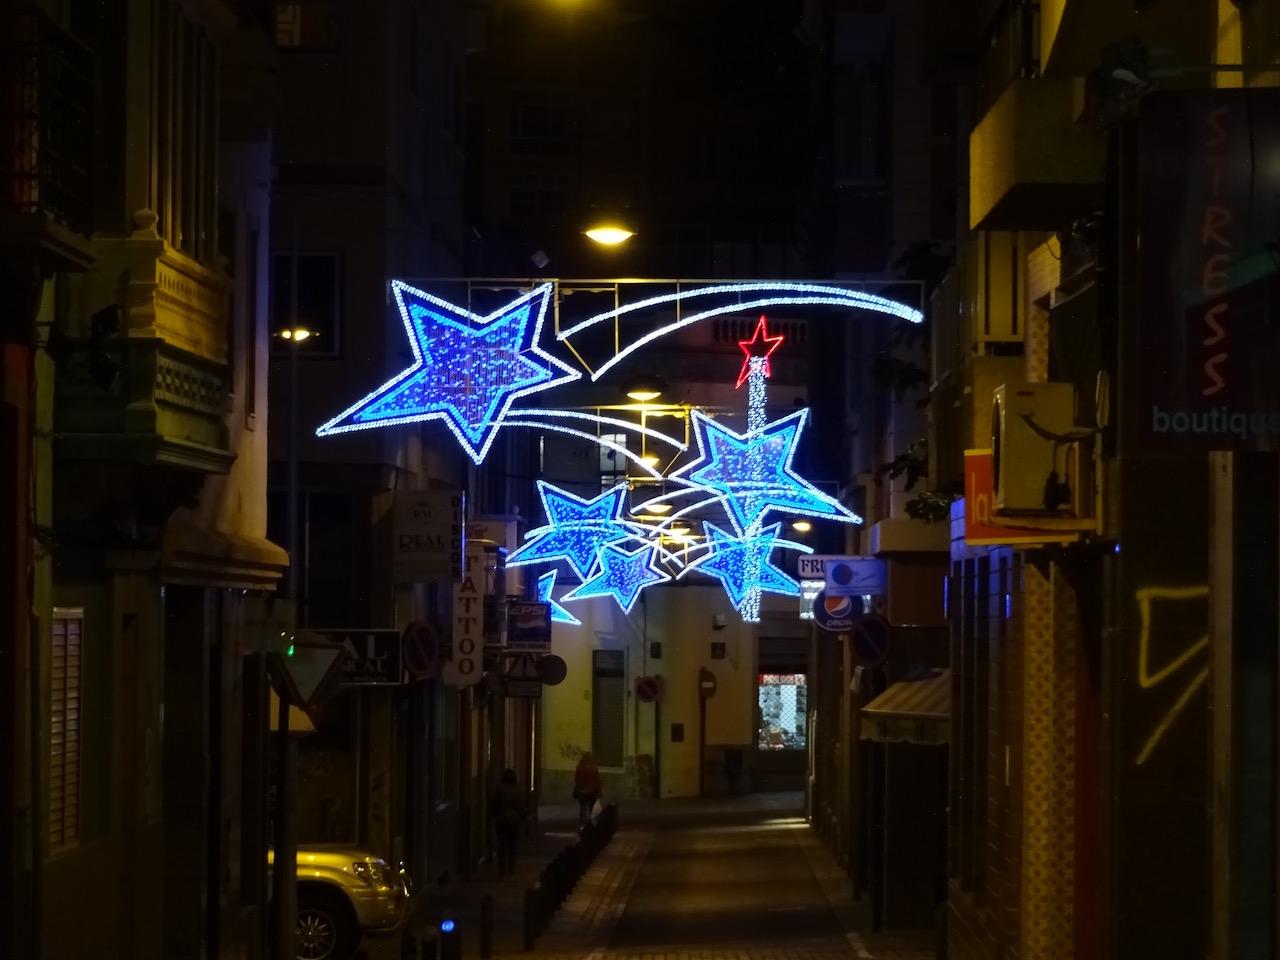 Weihnachtsbeleuchtung 6